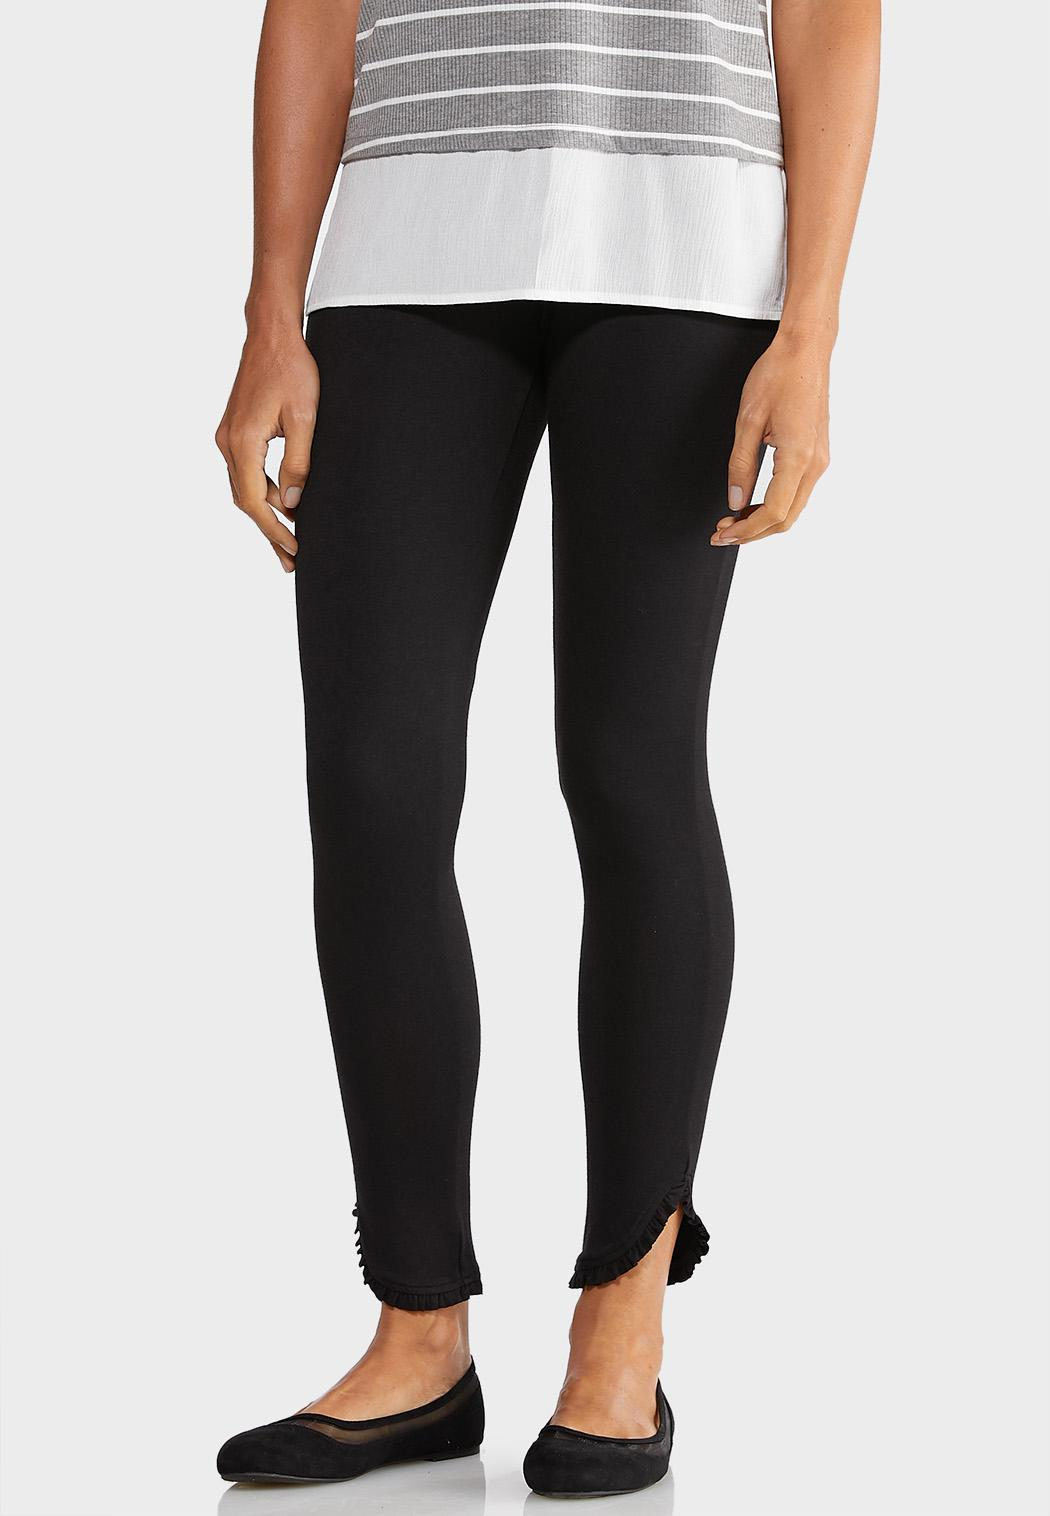 e65b87b6fe142 Women's Pants - Palazzo Pants, Slim Leg, Skinny Leg Pants, Leggings & More